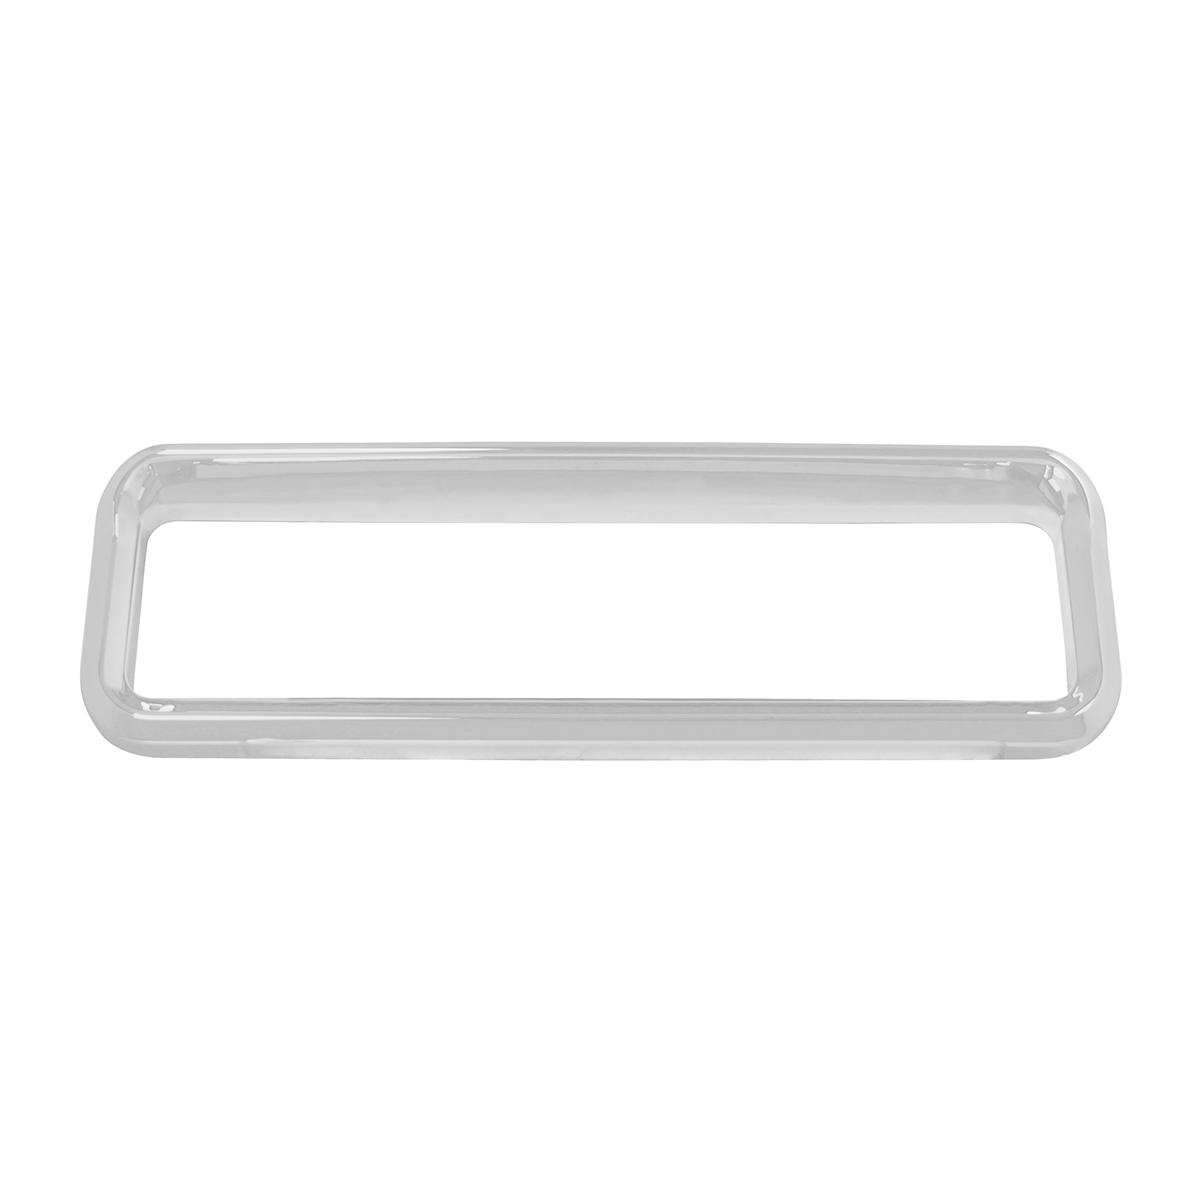 68727 Chrome Plastic Small Door Emblem Bezel for Freightliner